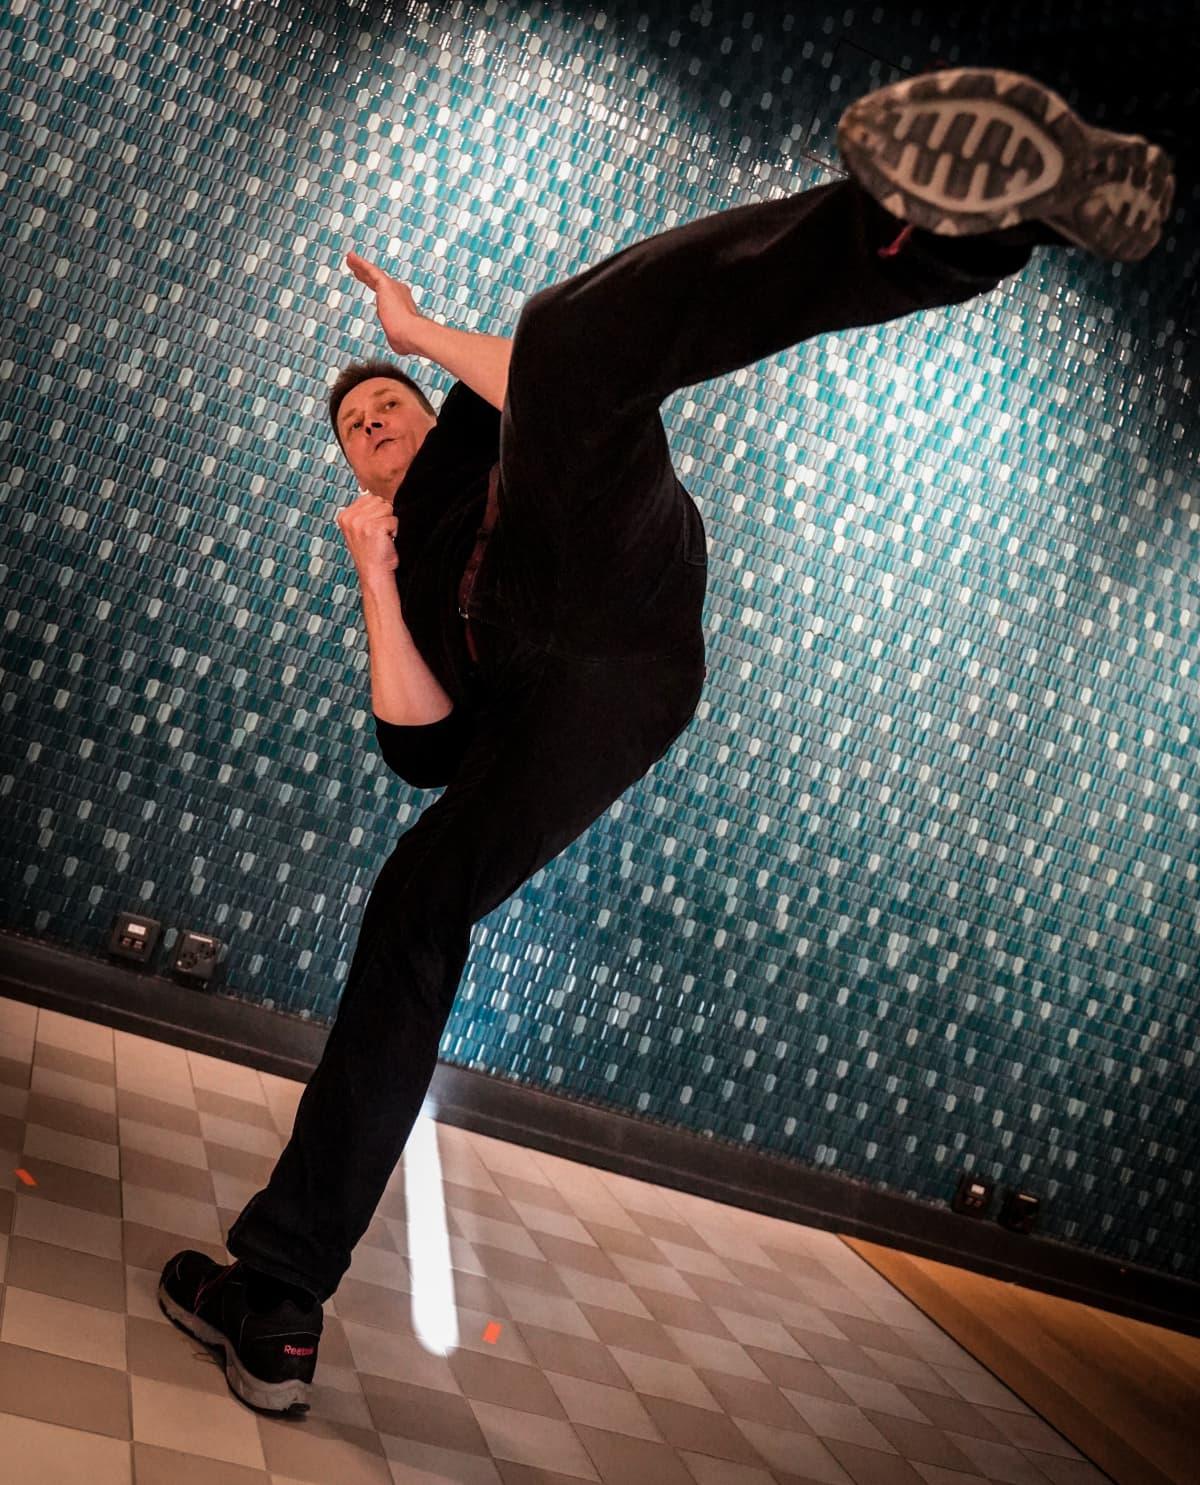 Hannu Leimu, Kadonneet, karate